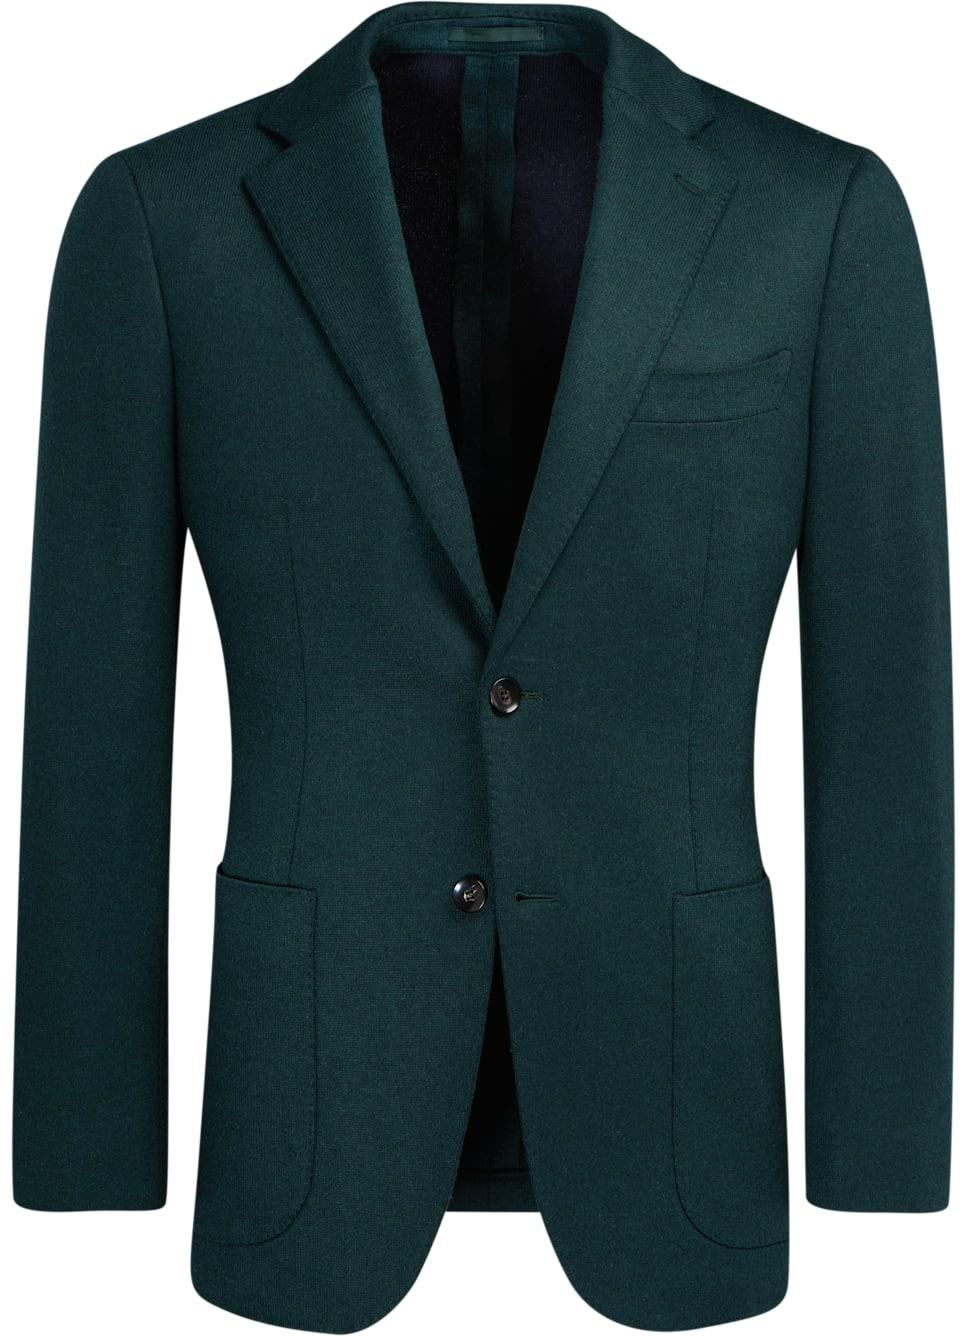 6c95b2b360db5 https://eu.suitsupply.com/pl/suits /havana-zielony-marynarka/C5581.html?cgid=Suits&prefn1=colorID&prefn2=size&prefv1=green&prefv2